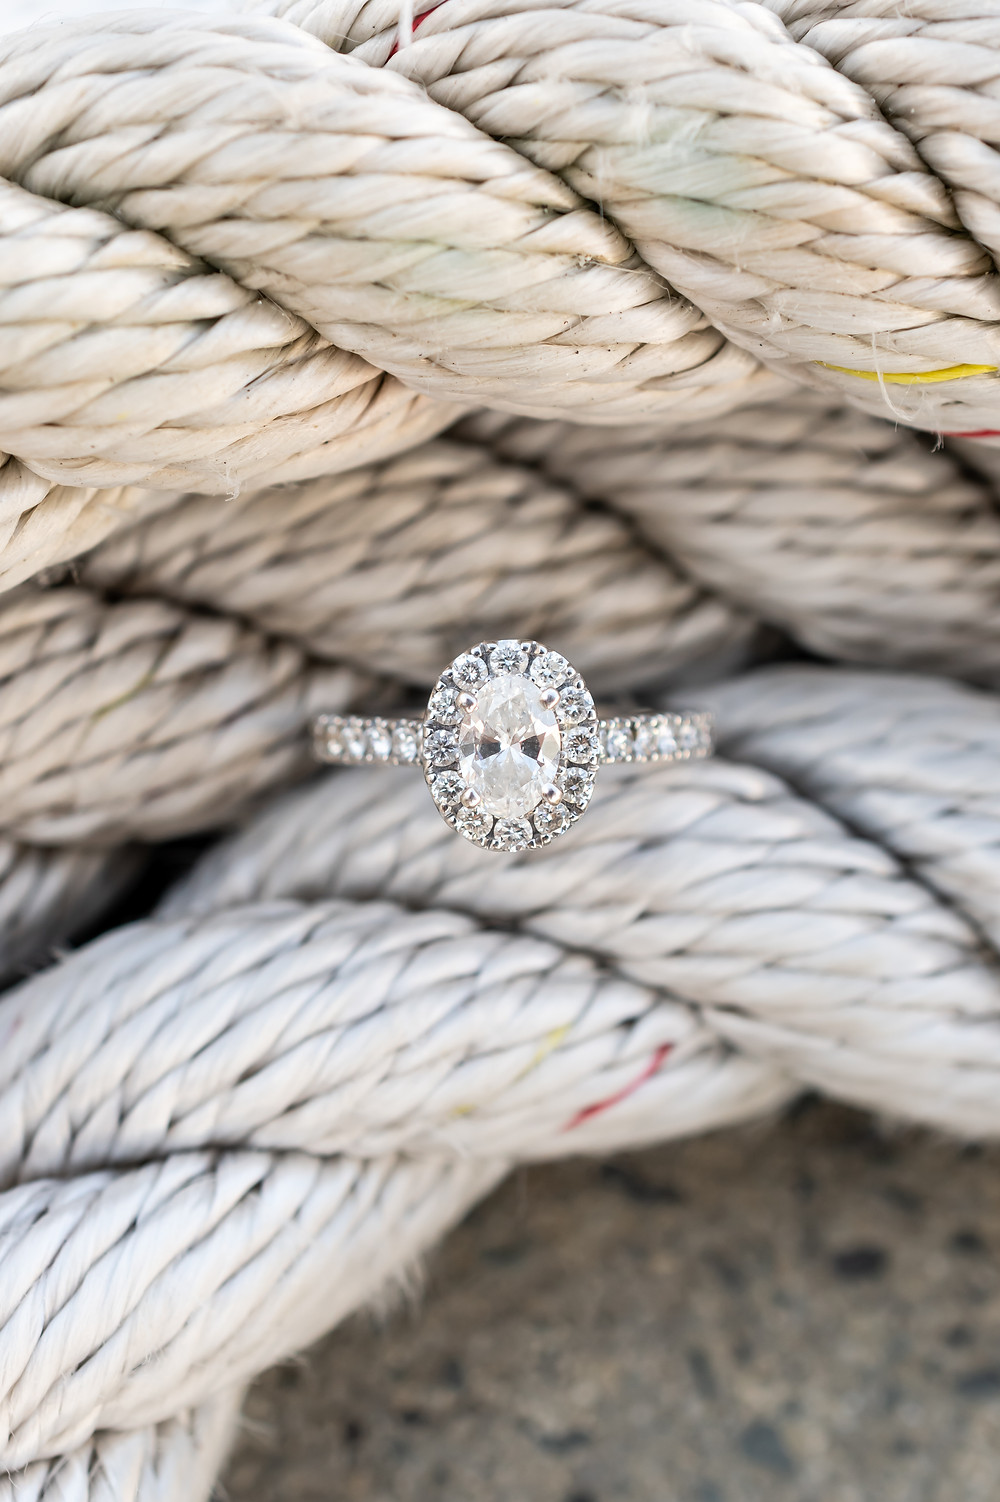 Engagement ring in Savannah, Georgia.